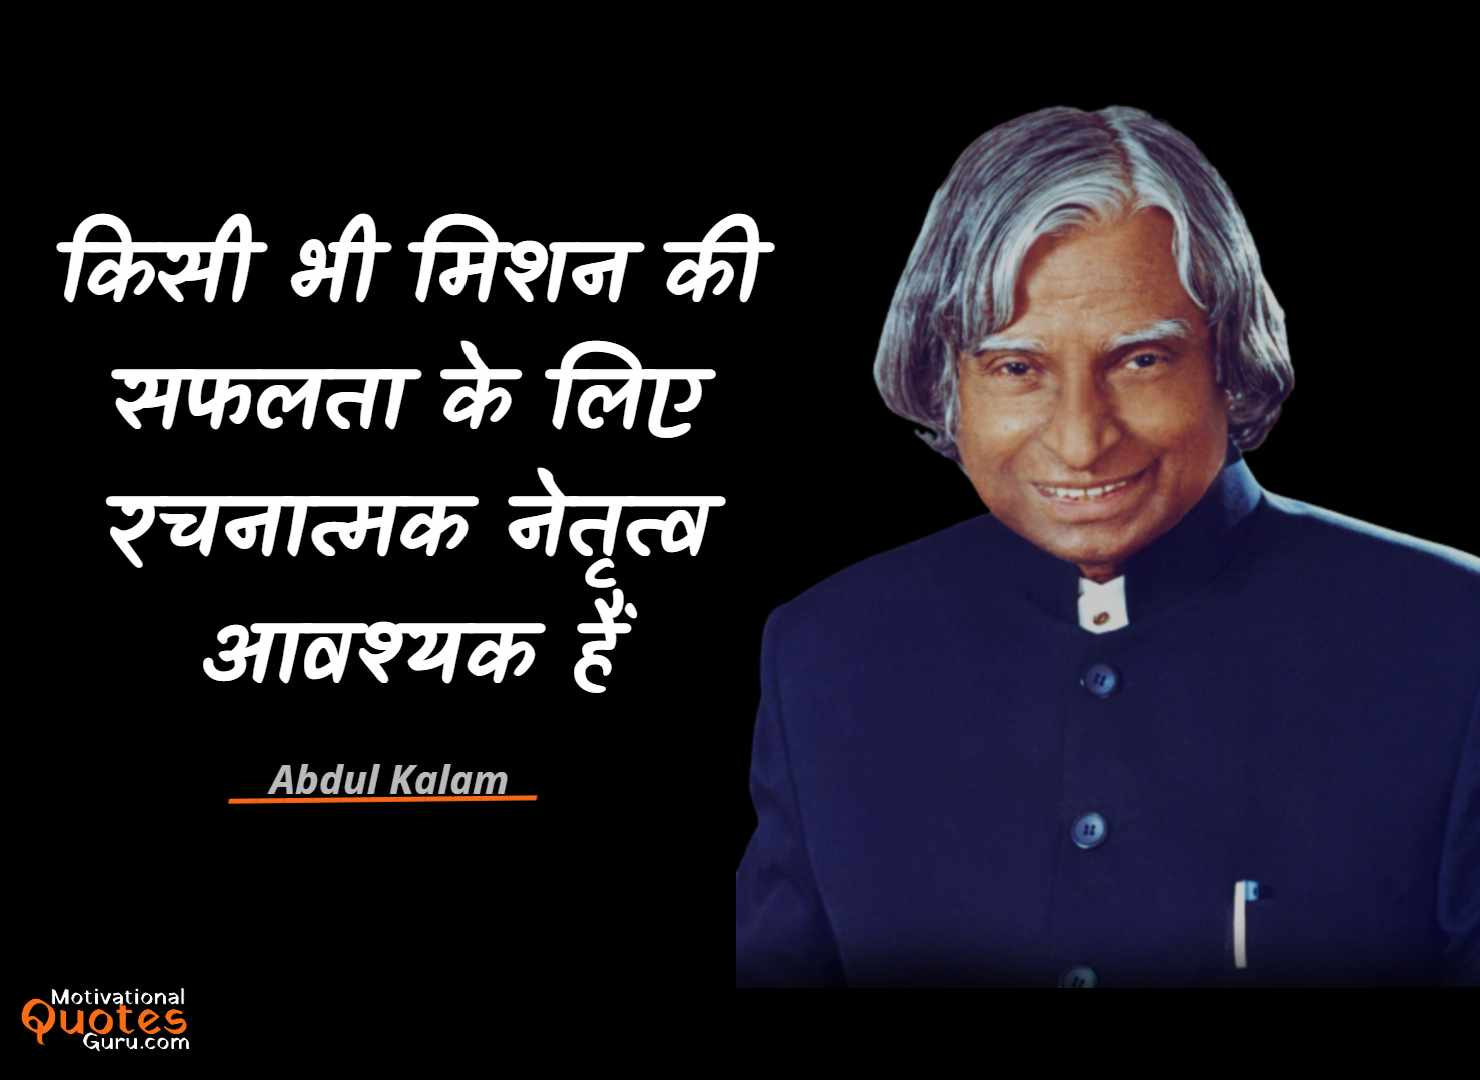 APJ Abdul Kalam के सर्वश्रेष्ठ विचार